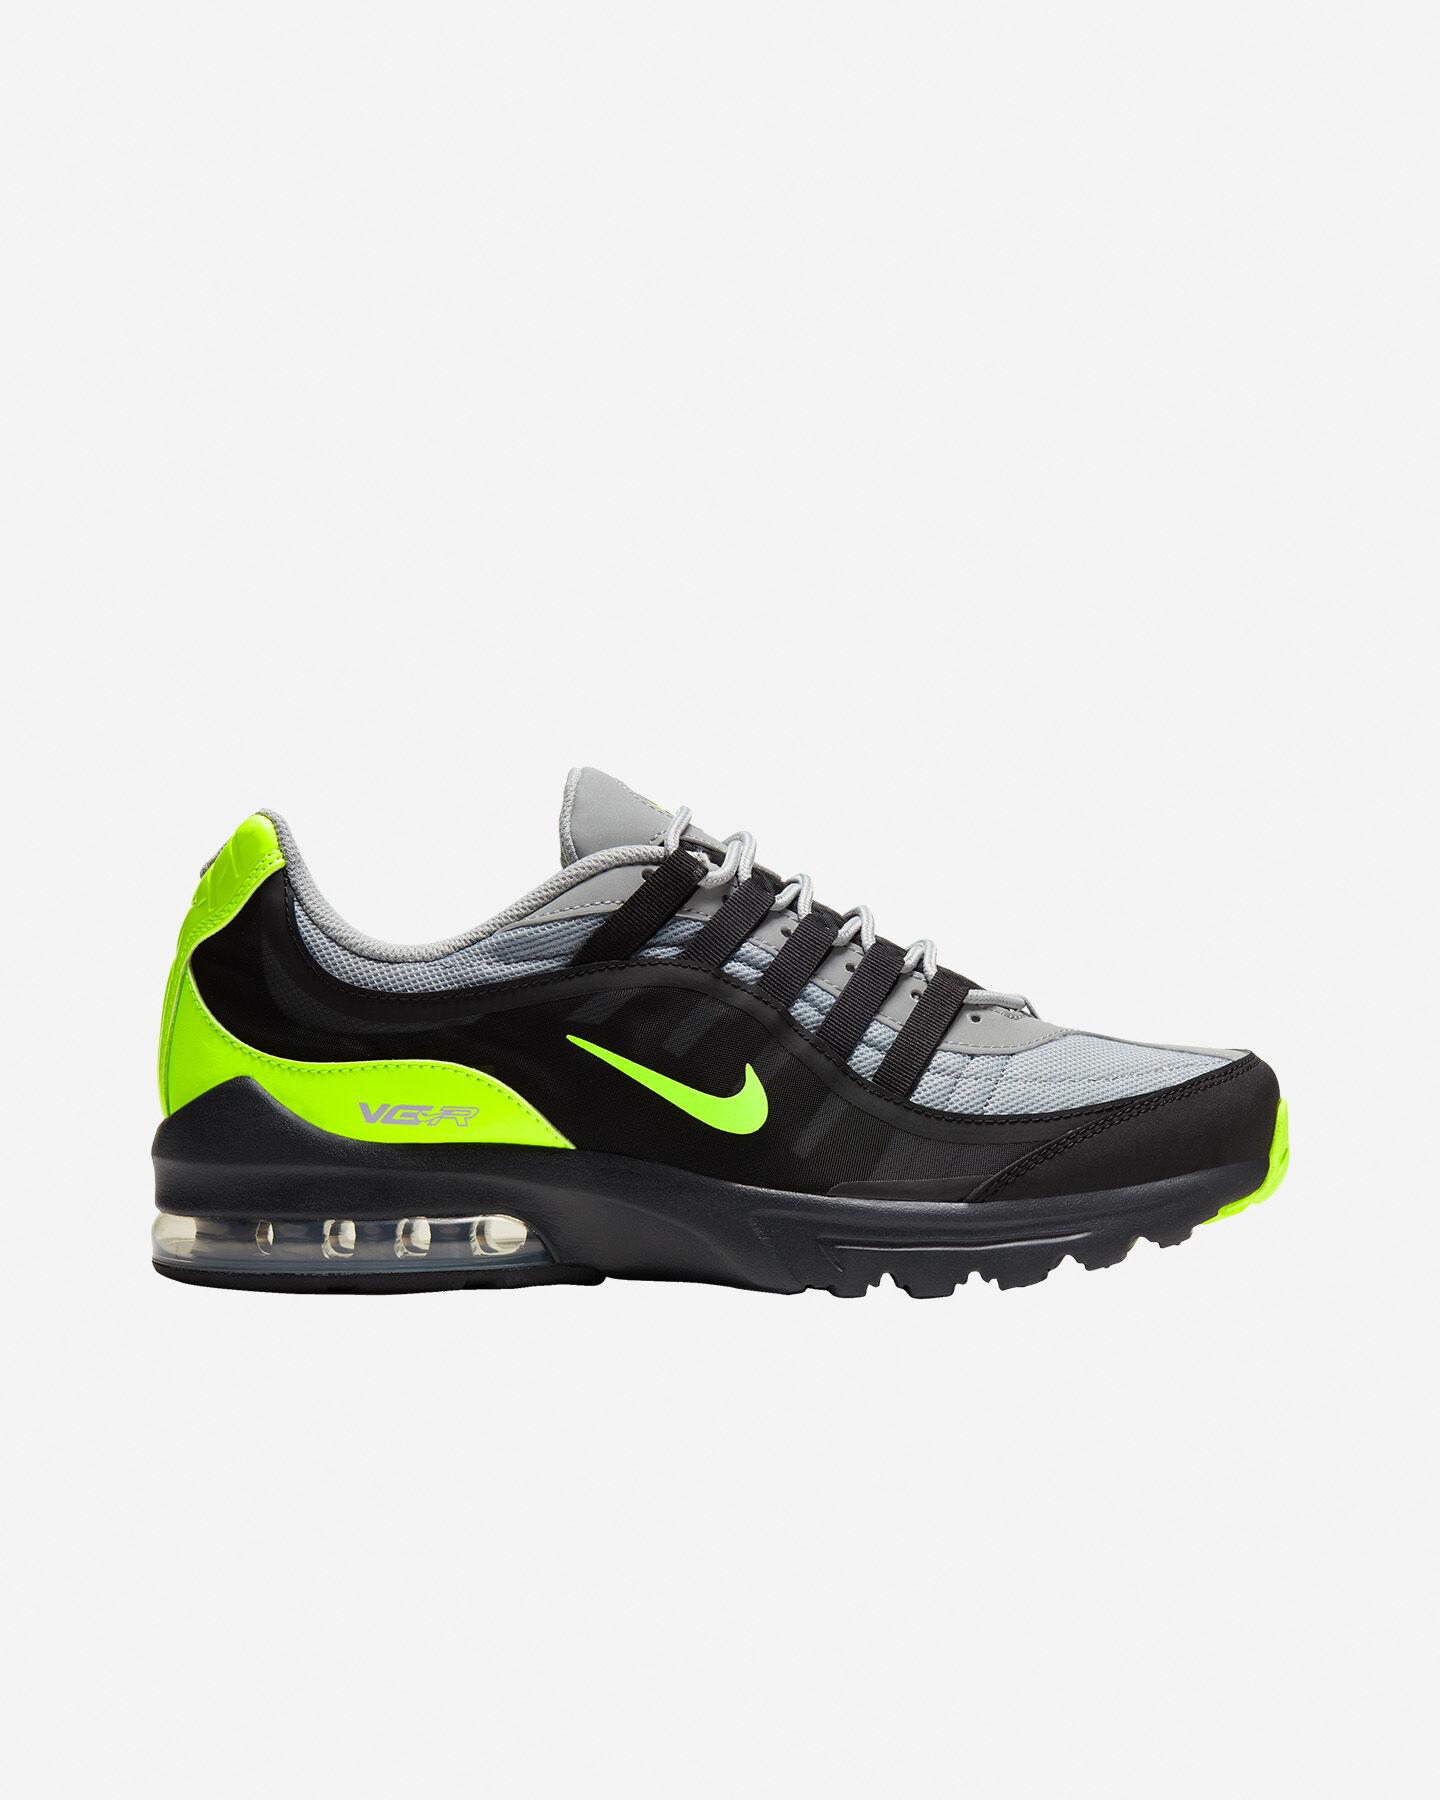 Scarpe sneakers NIKE AIR MAX VG-R M S5247961 scatto 0